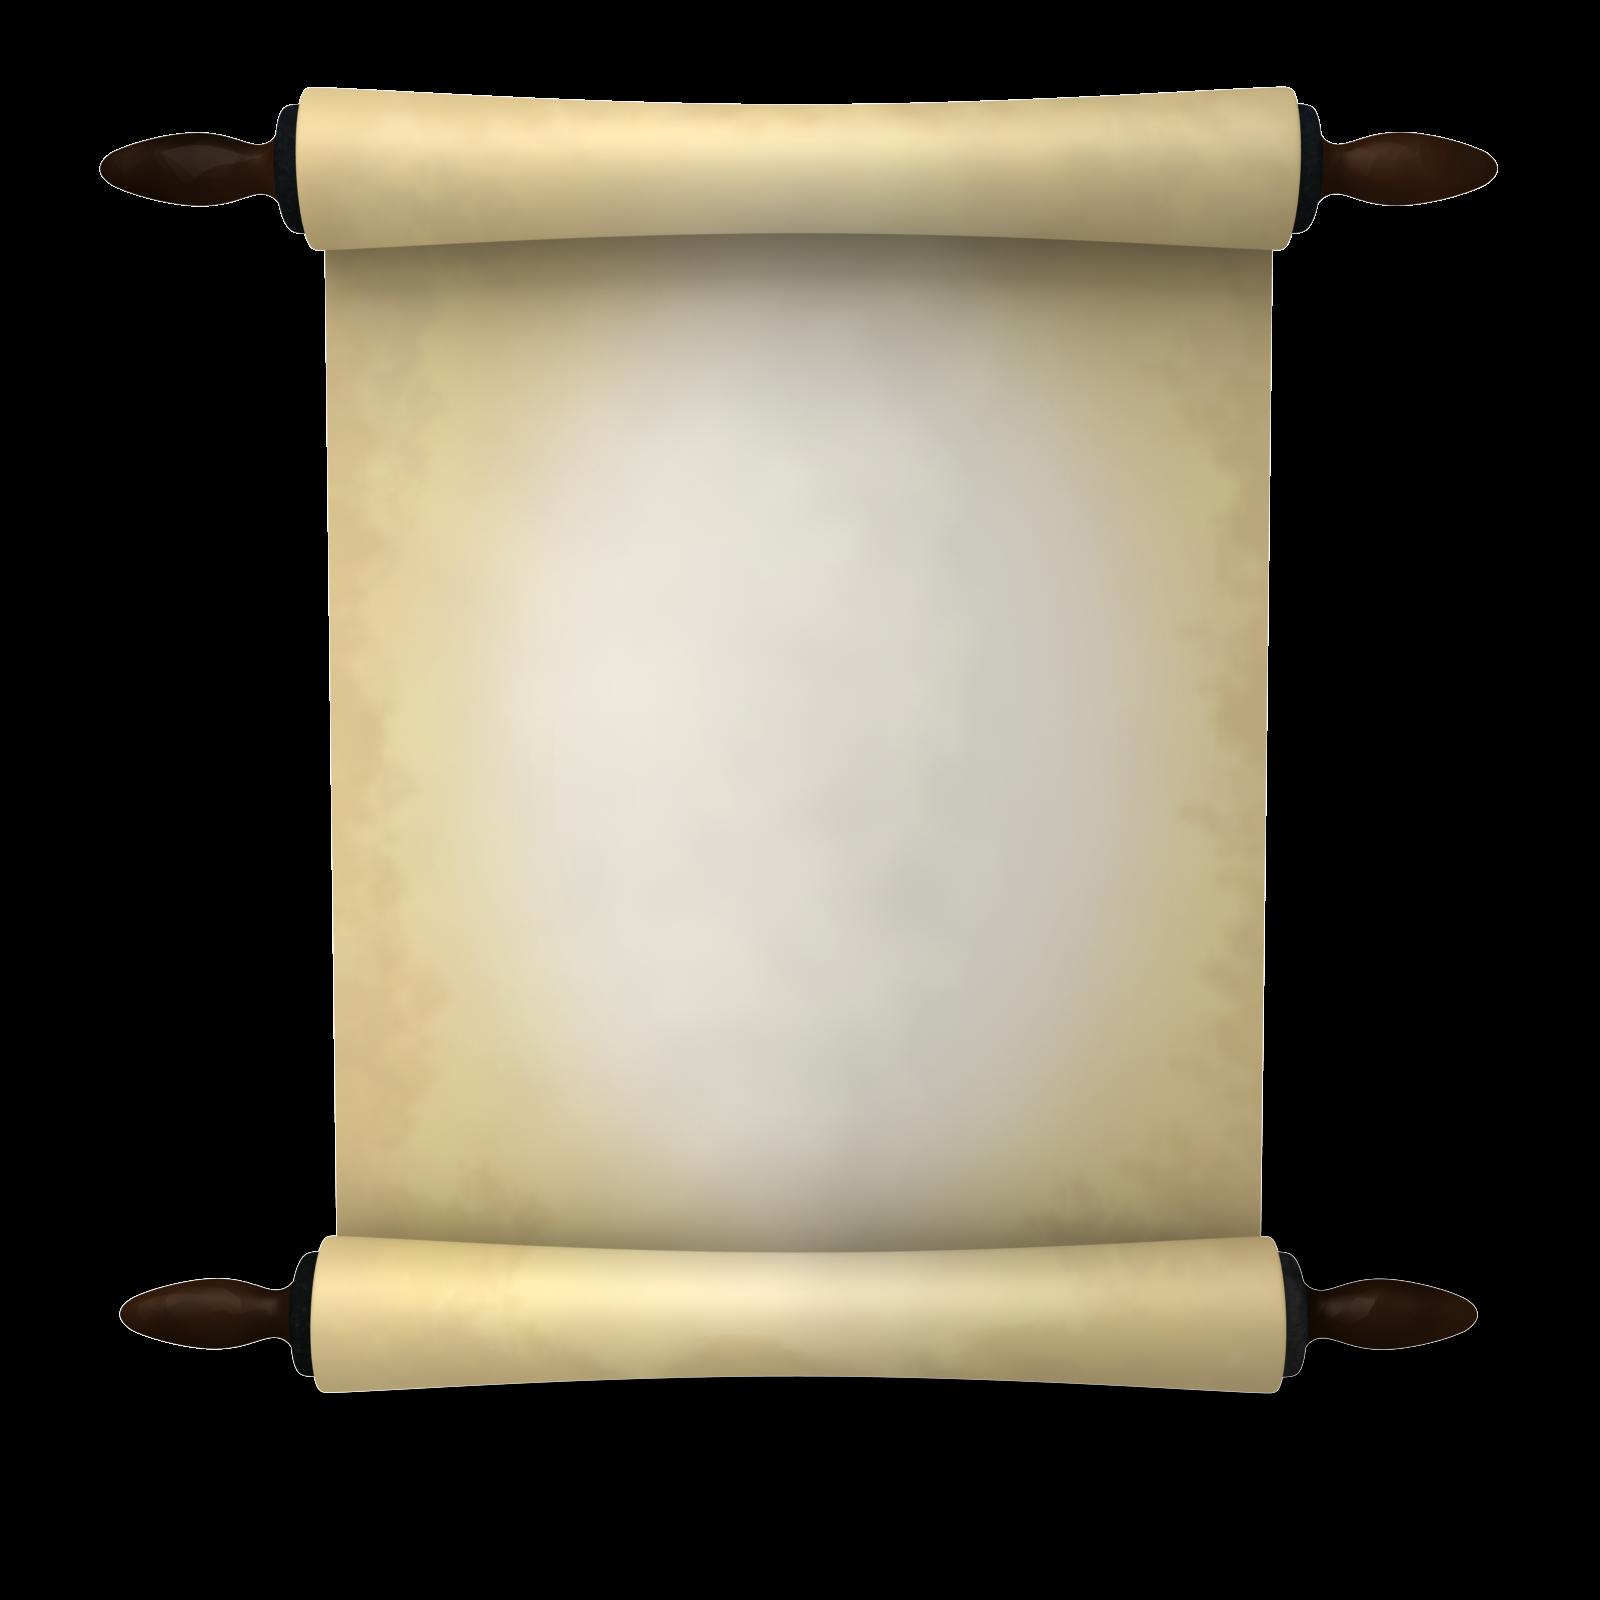 Scroll - Scroll PNG HD